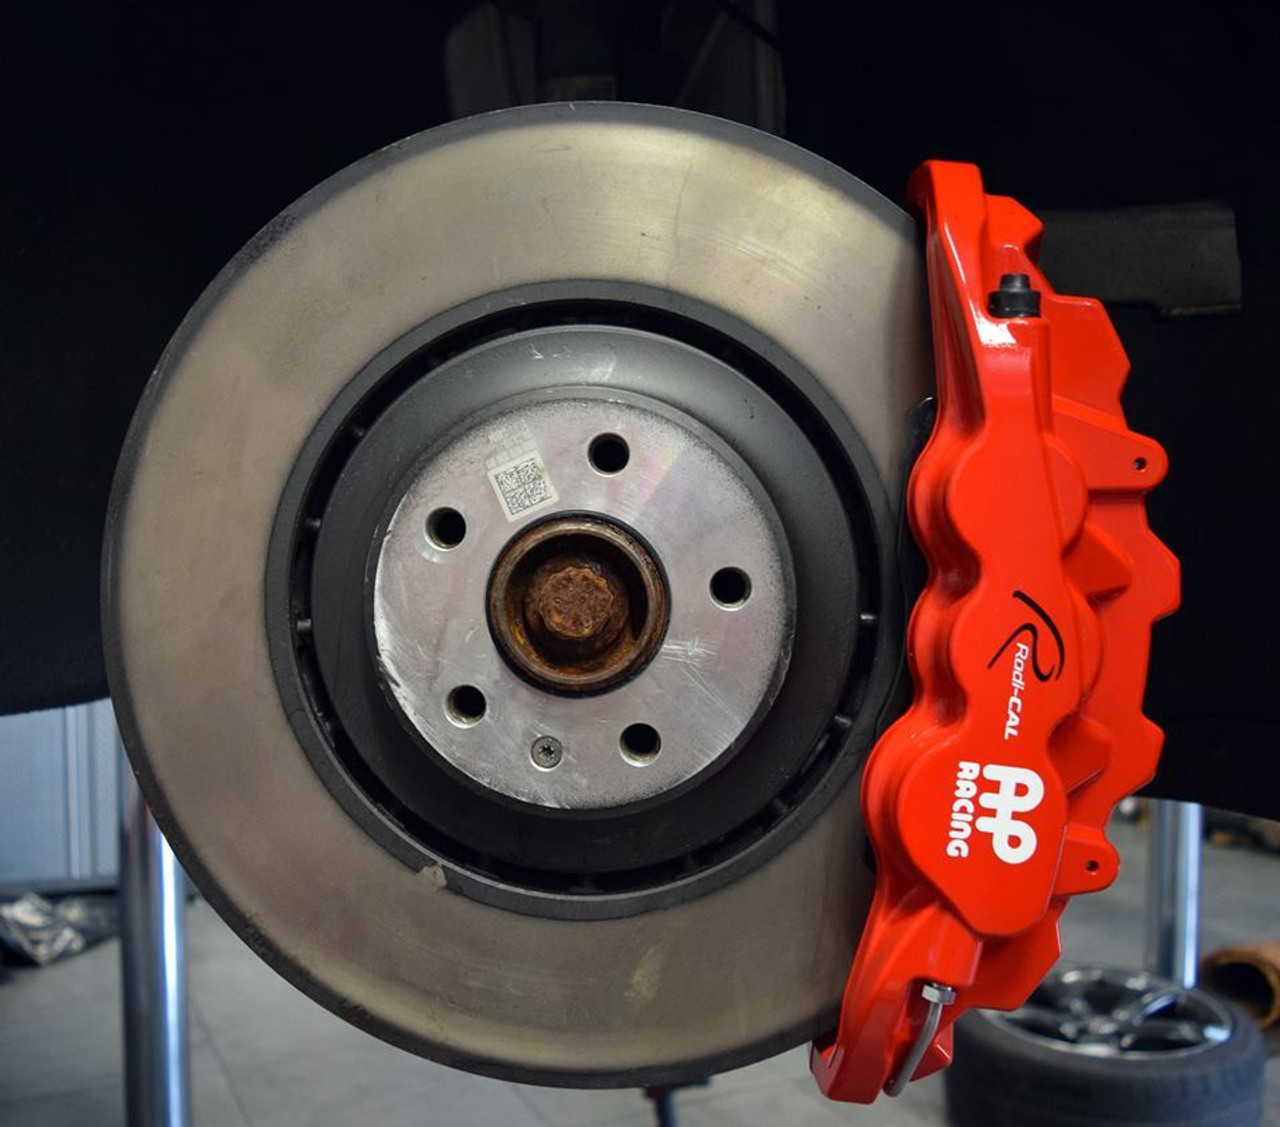 FULL KIT HEL Performance Braided Brake Lines Hoses For BMW 5 Series F10 M5 2010